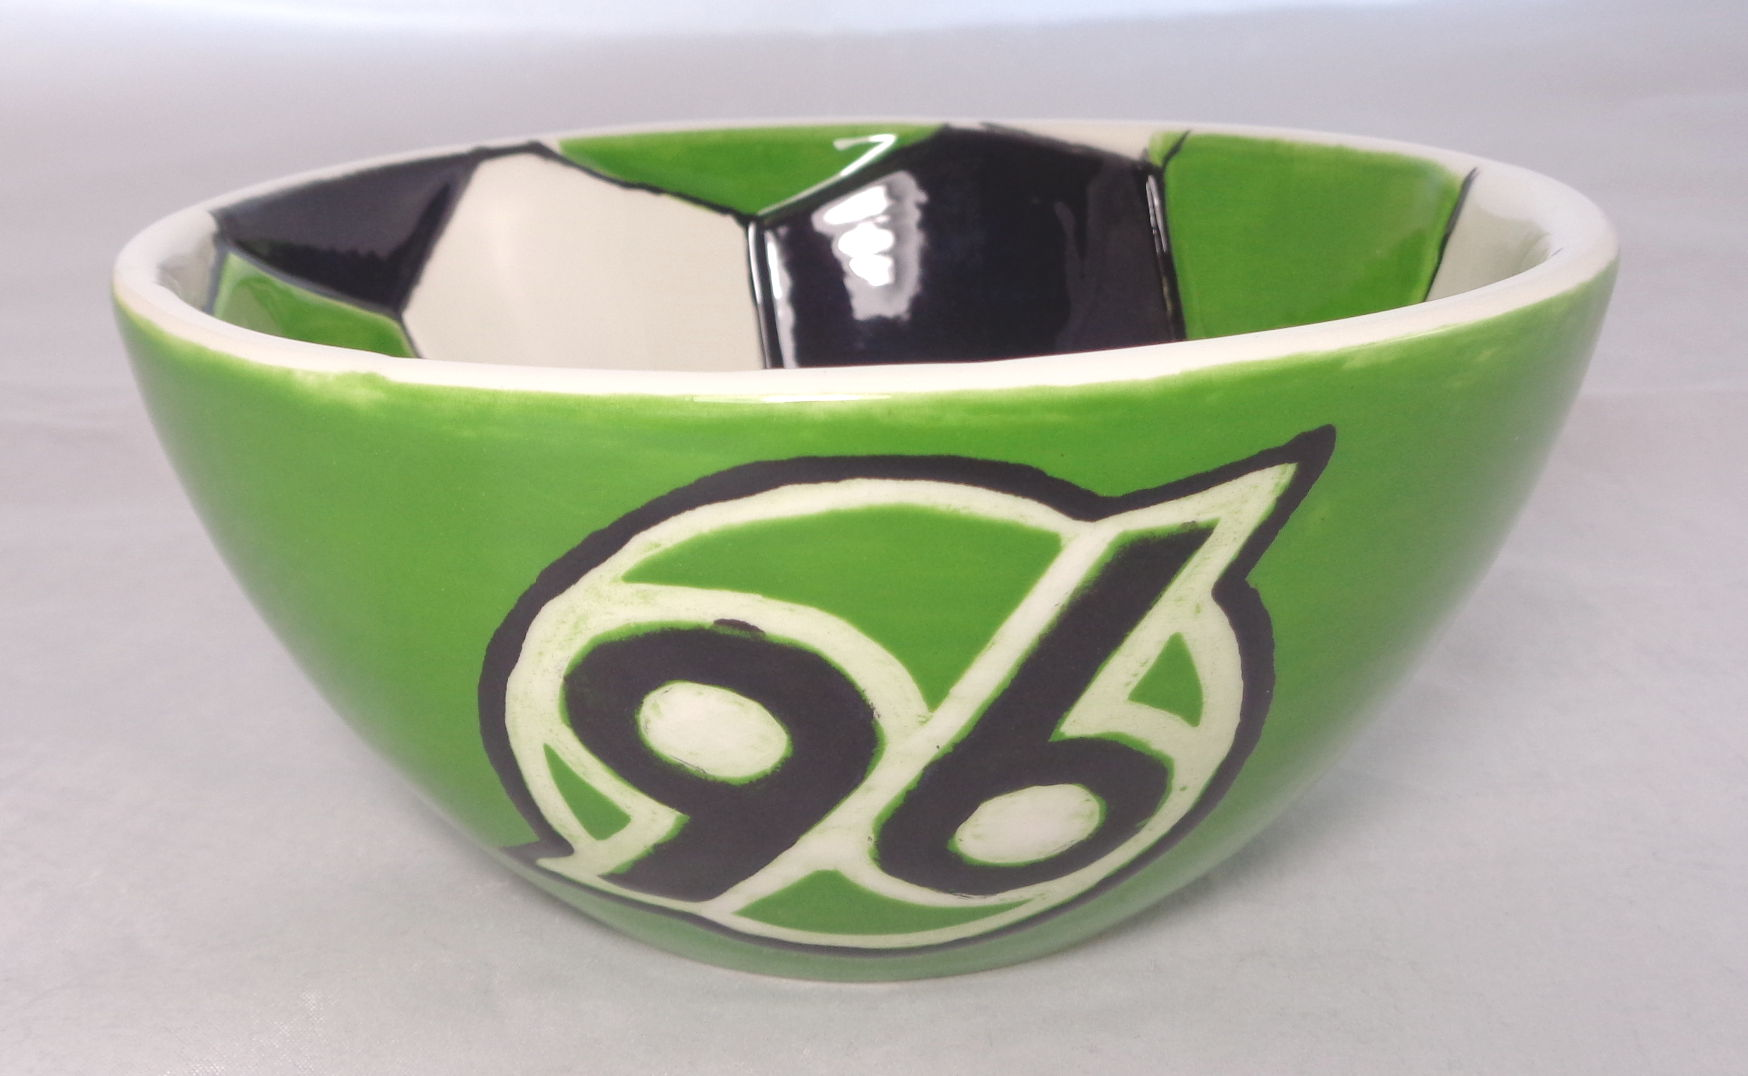 Bemalte Keramik H96 Fussballschale